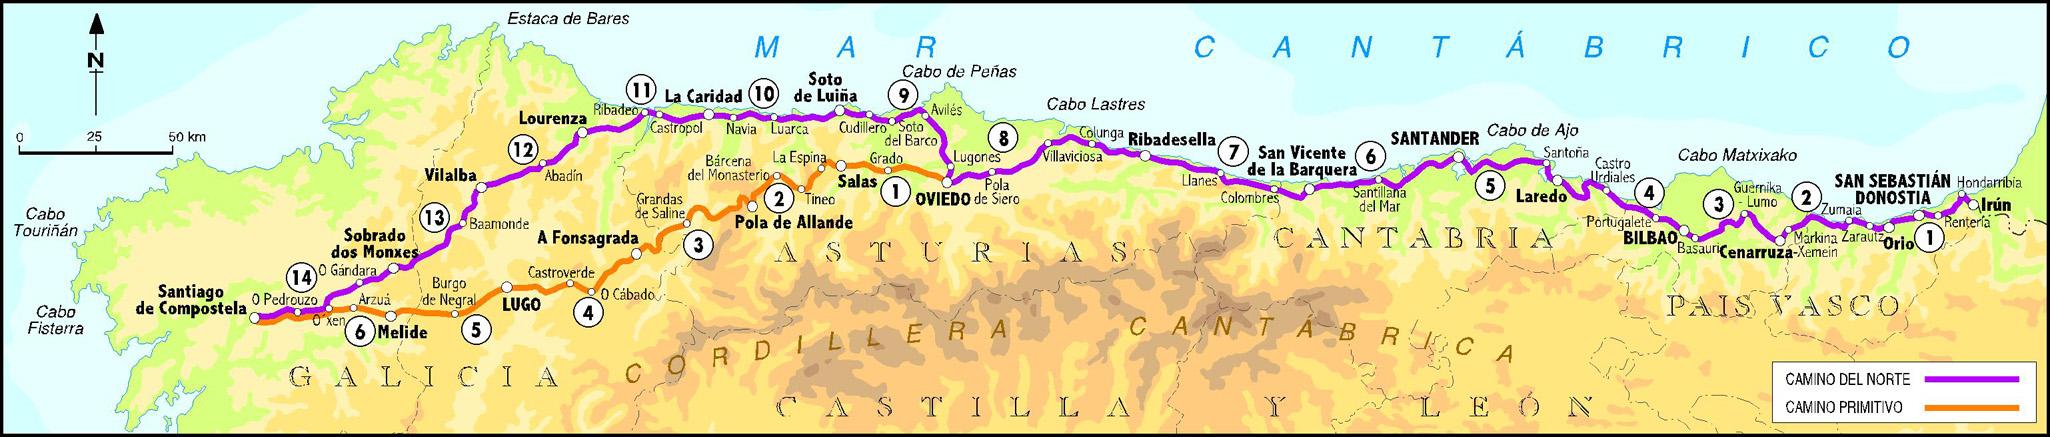 el camino trail spain map with Camino De Santiago En Llanes on El Camino De Santiago in addition Camino Santiago Destino Veraniego moreover Bilbao Santiago additionally 774105695 also El Caminito Del Rey Spain.